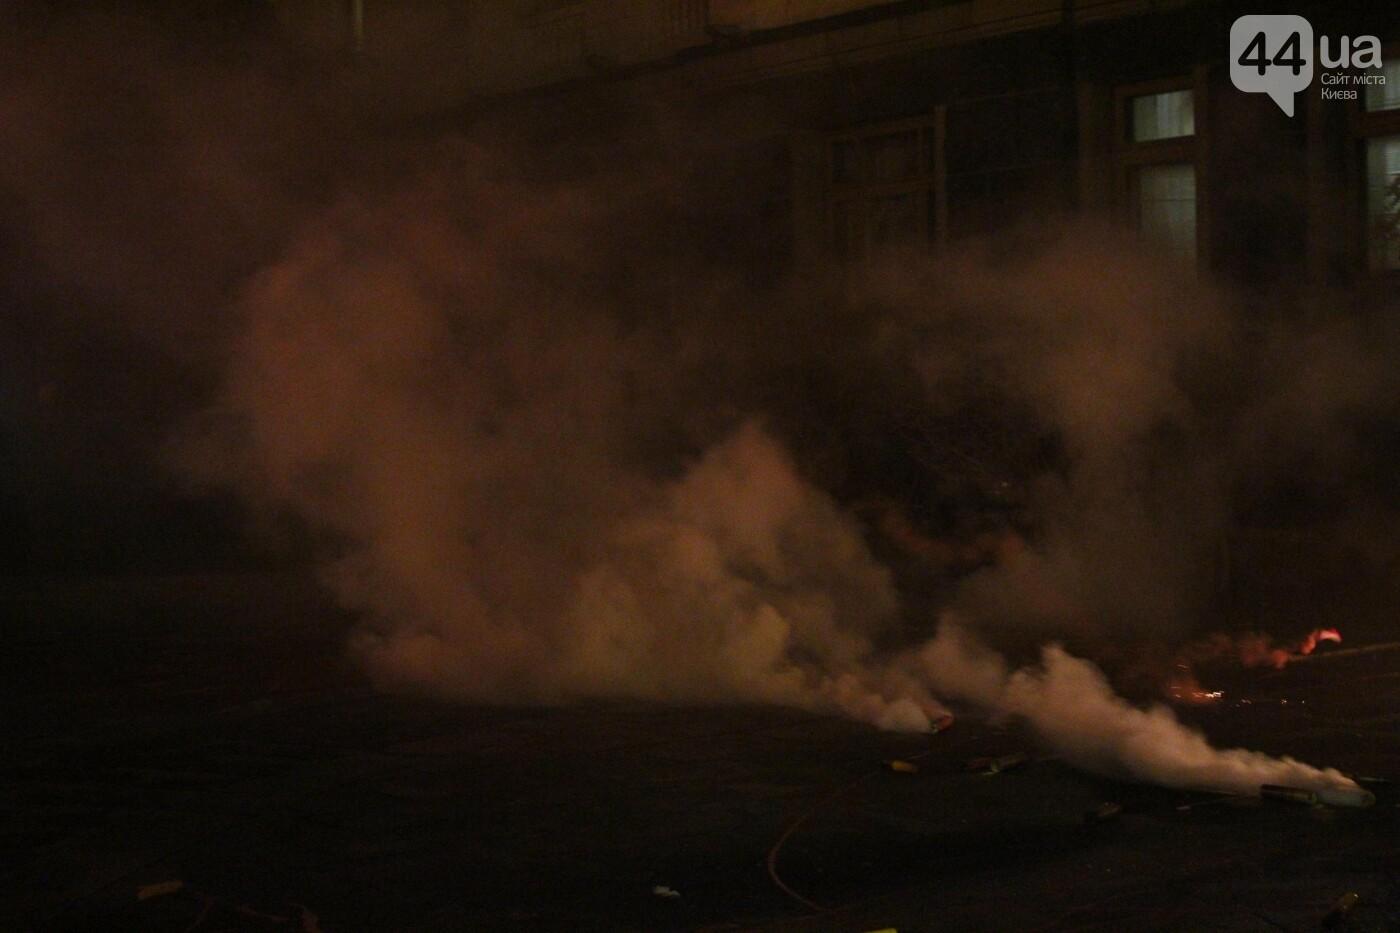 Сожгли табличку и разбили окна: акция в поддержку Стерненко переросла в беспорядки, - ФОТО, фото-11, Фото: 44.ua